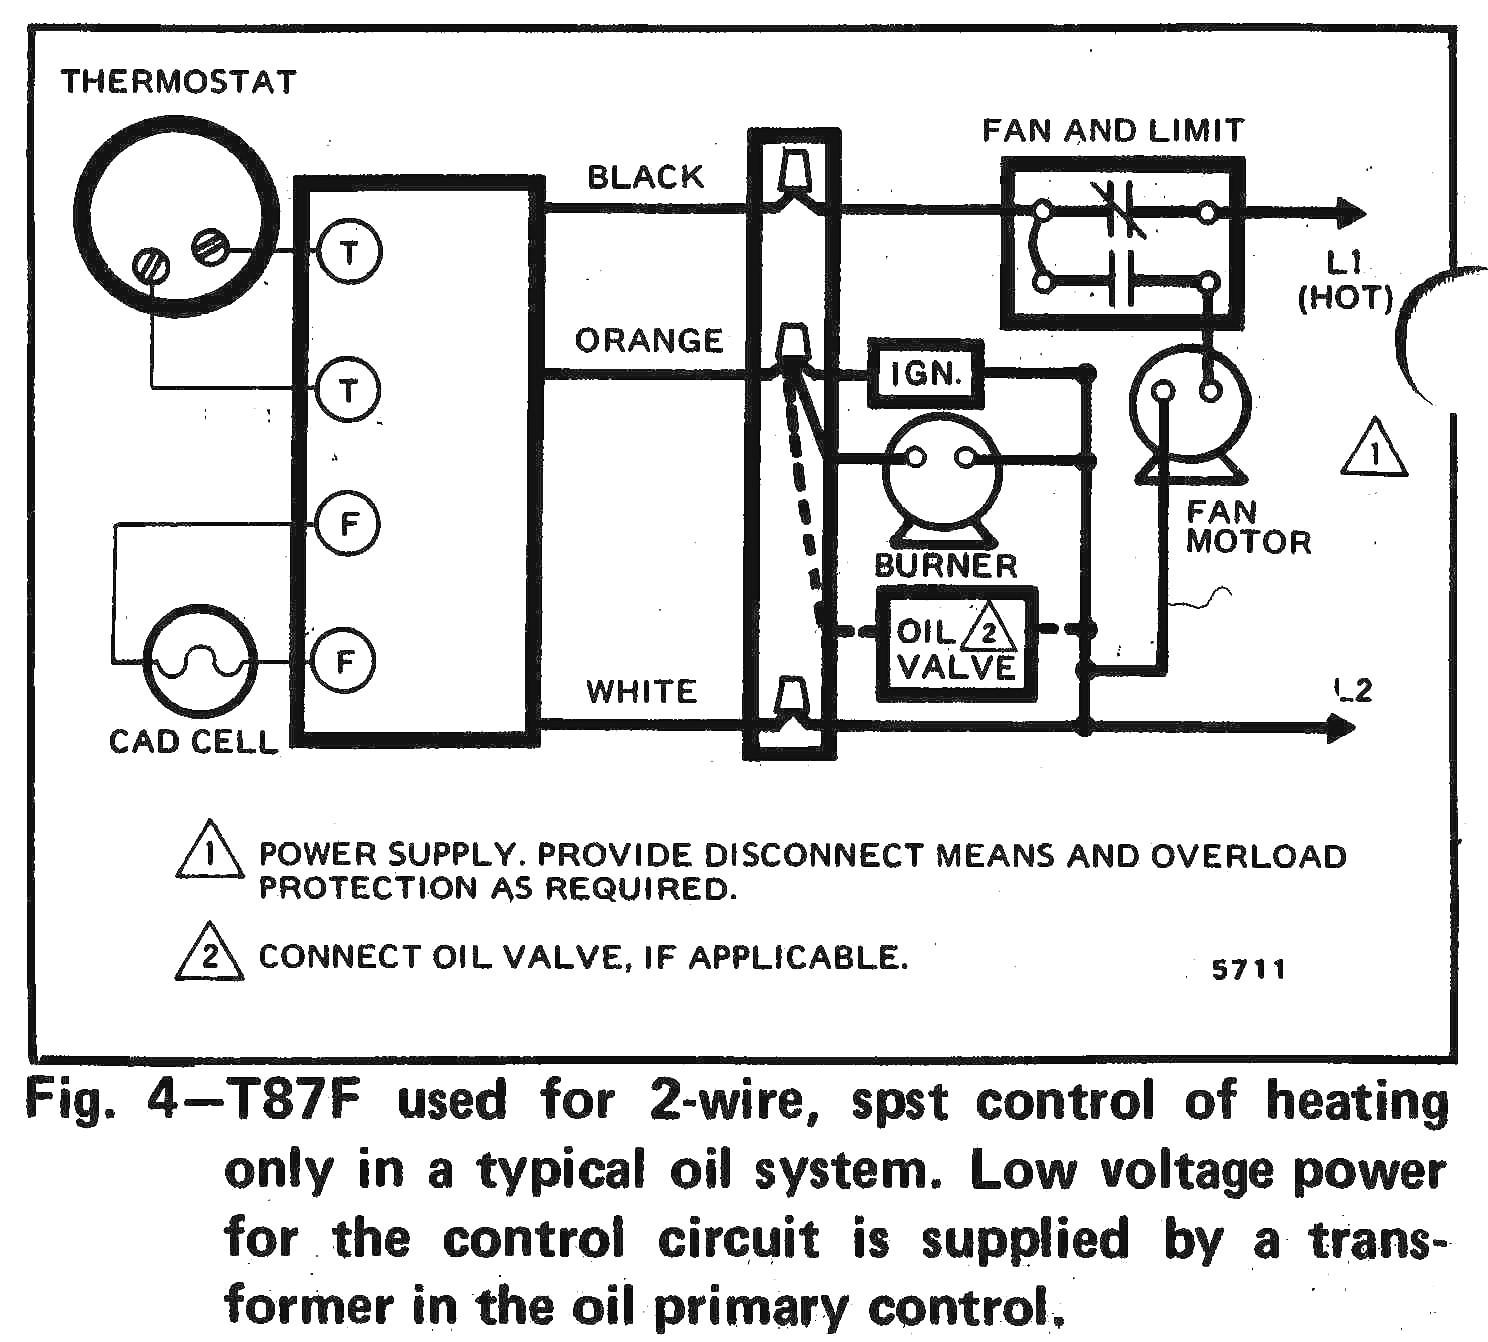 olsen oil furnace wiring diagram wiring diagrams schematics beckett oil burner thermostat diagram oil furnace wiring